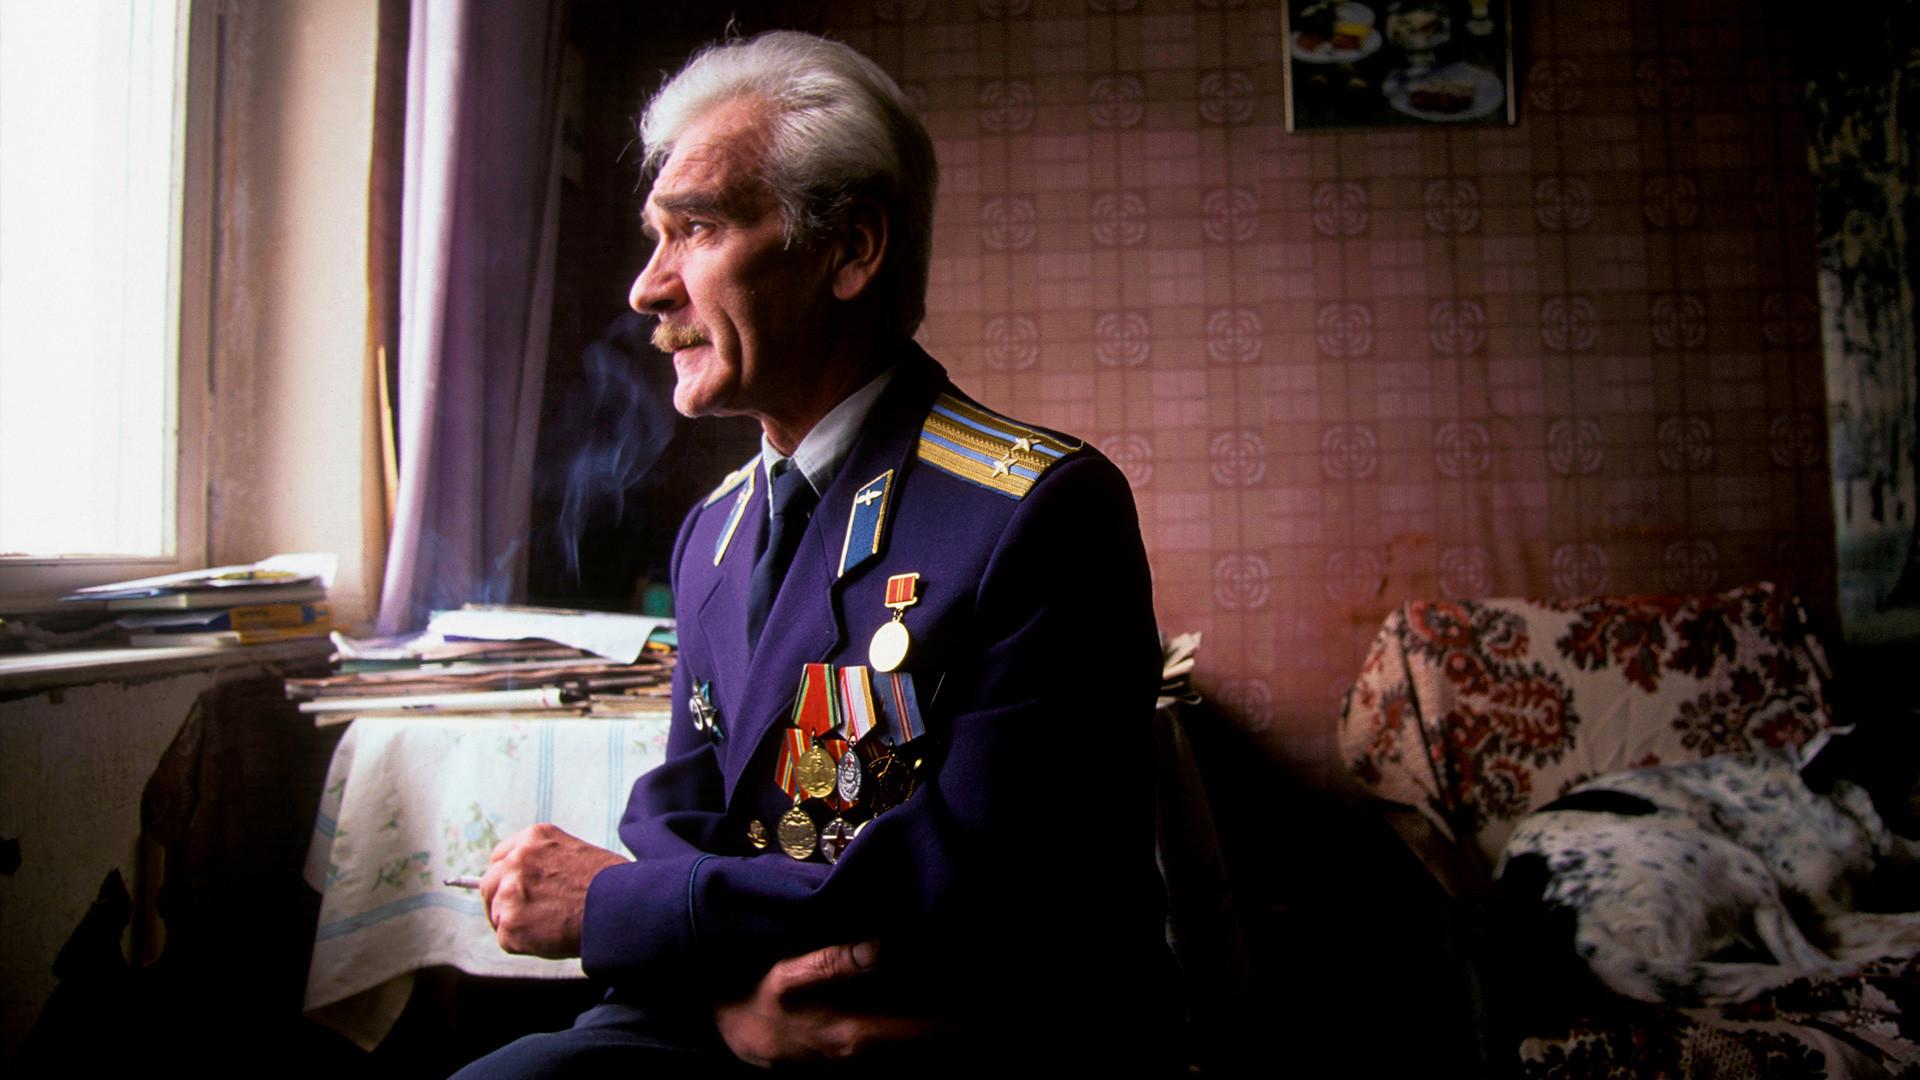 Stanislav Petrov wearing his military uniform in 1999.